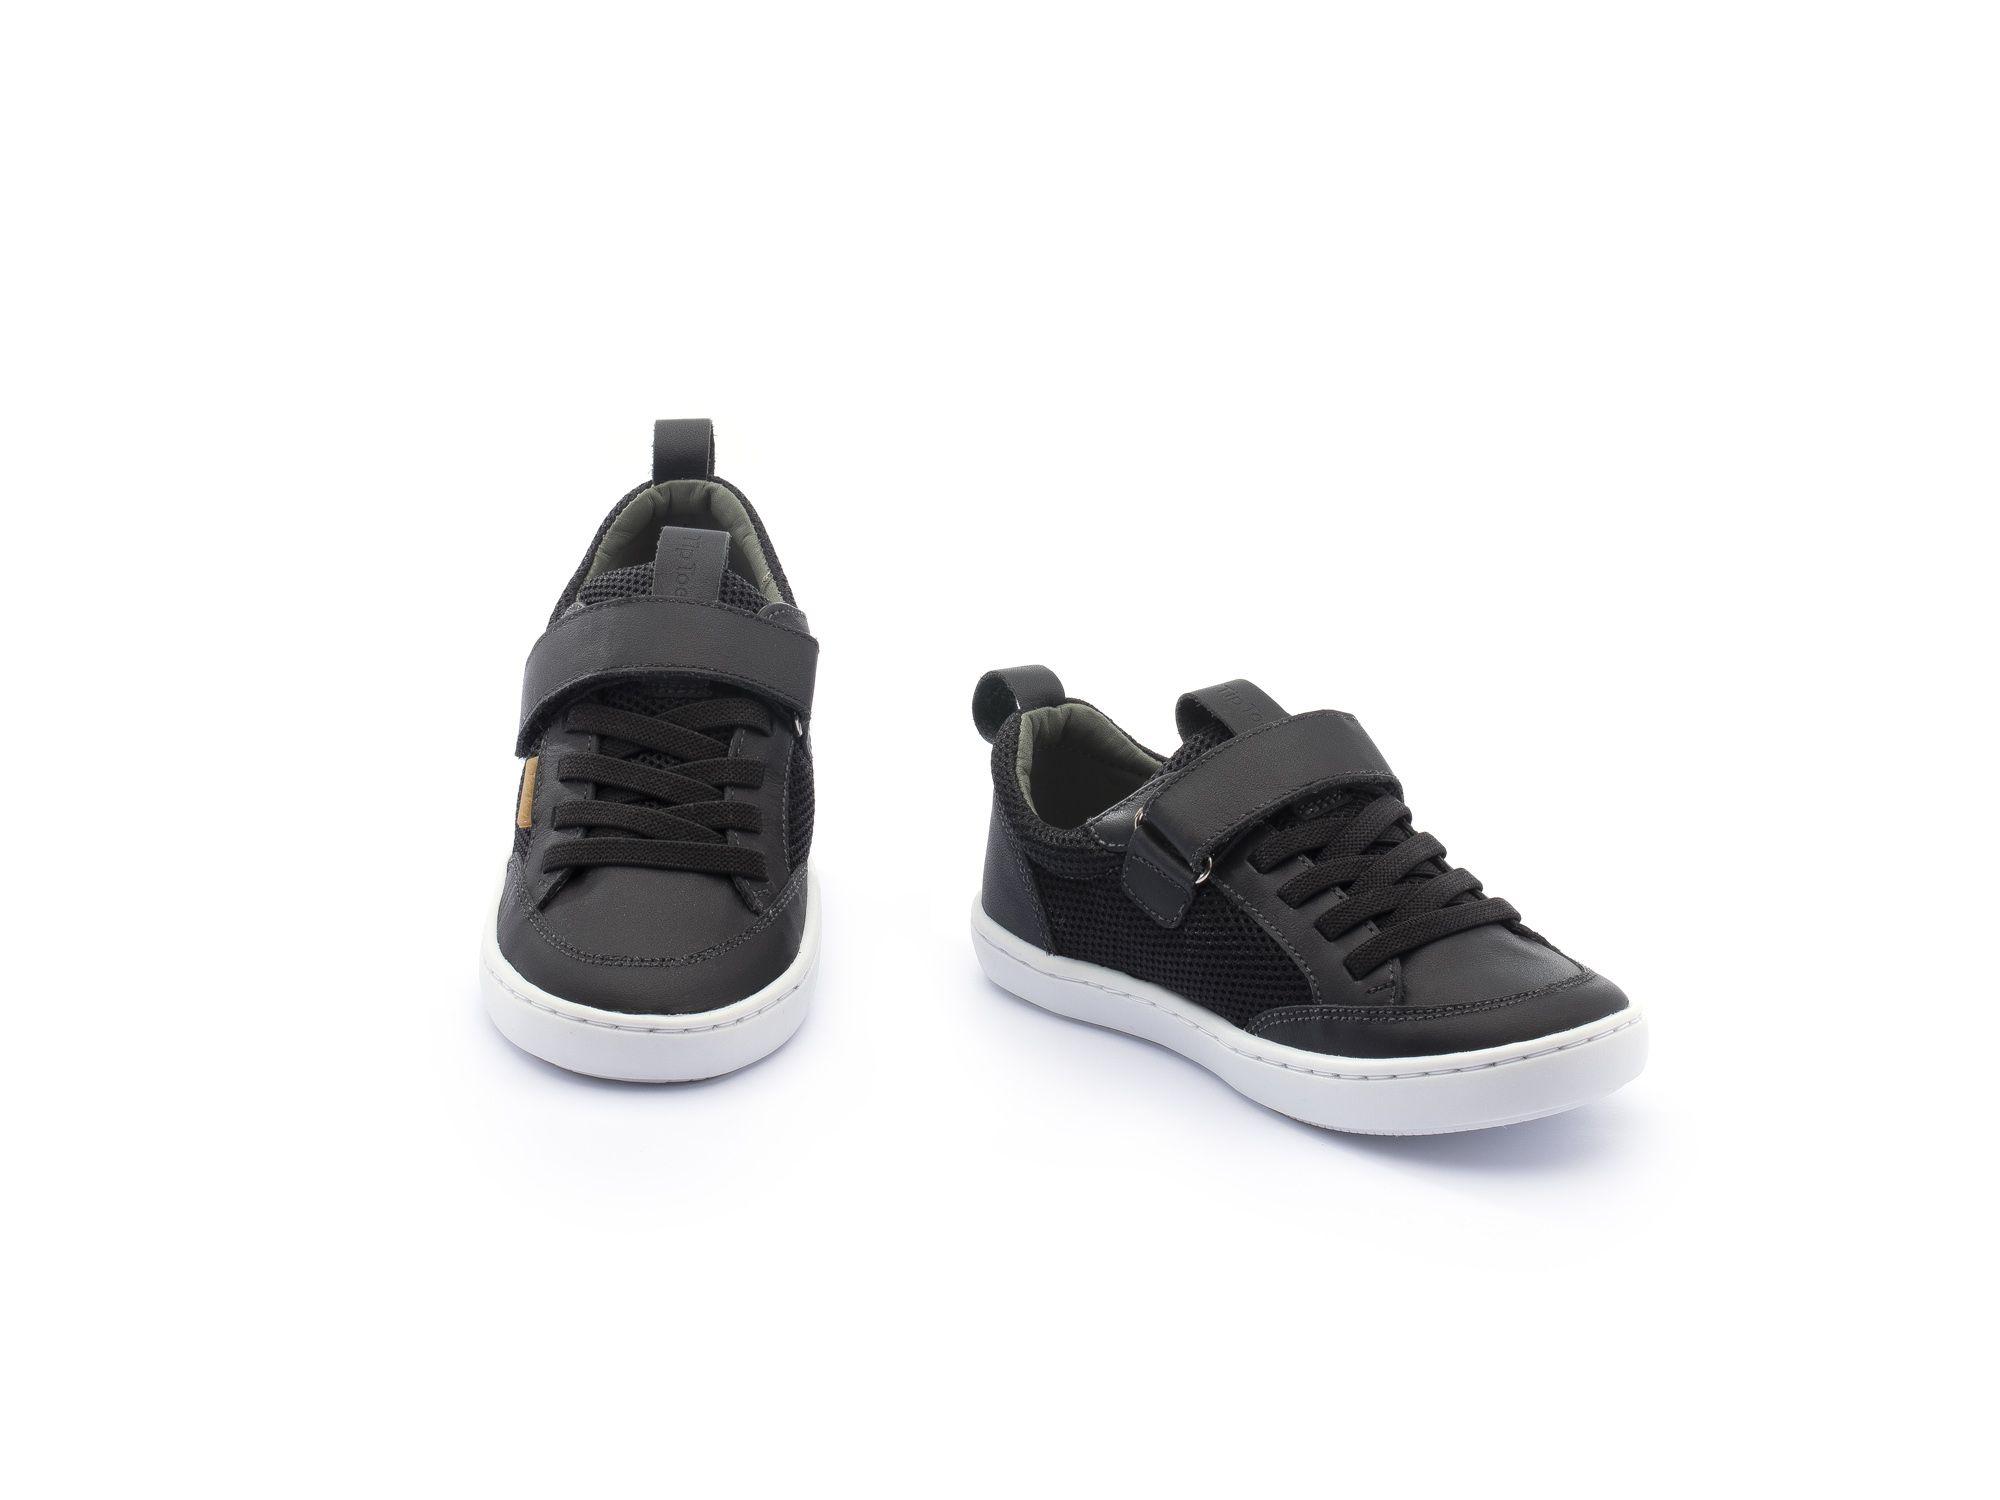 CALÇADO INFANTIL - LITTLE URBAN - MESH BLACK - TIP TOEY JOEY